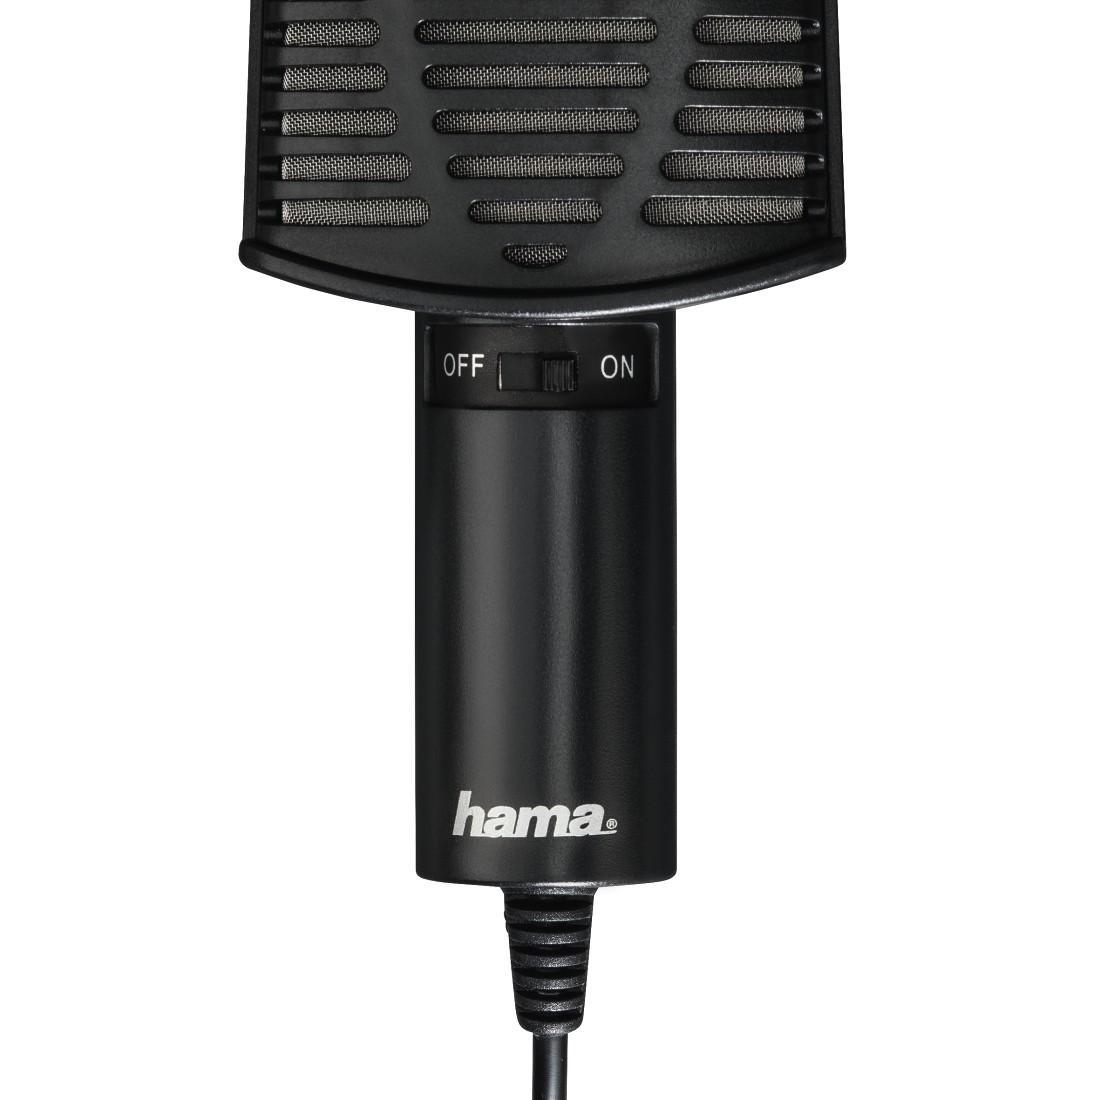 Настолен микрофон HAMA MIC-USB Allround, за PC/лаптоп, USB, Черен-3